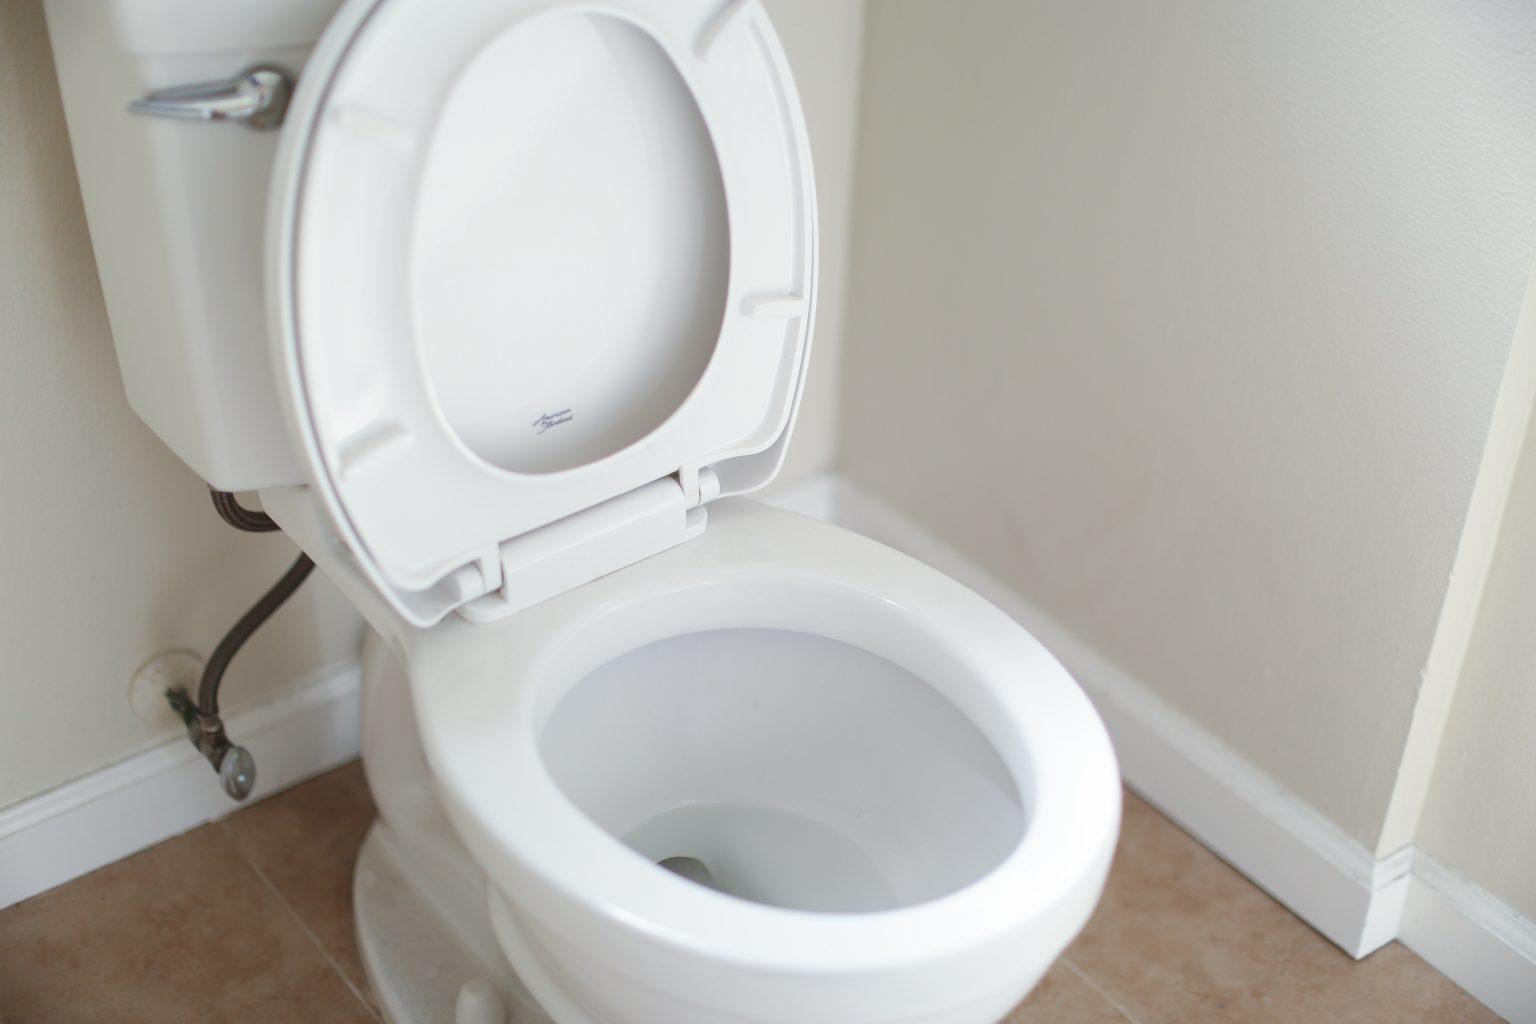 Toilets Repair Calgary